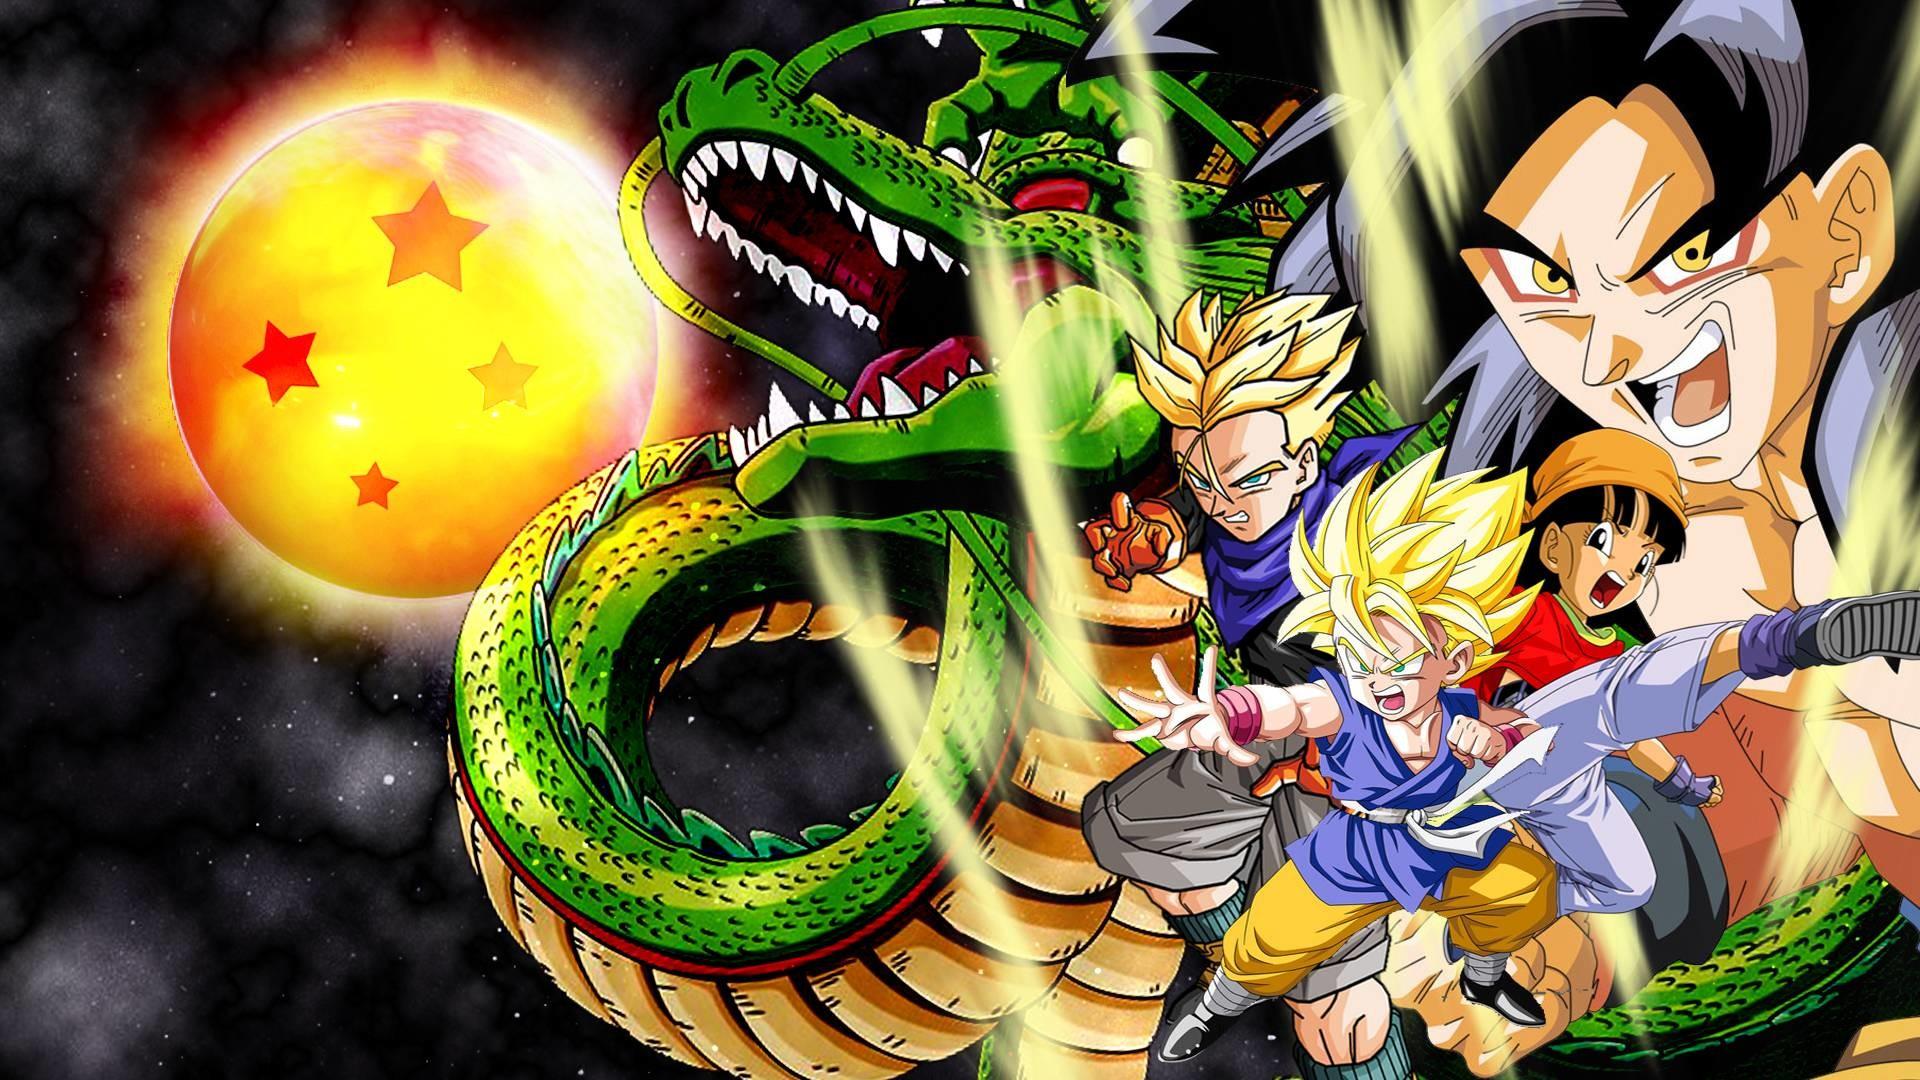 Dragon Ball Gt Hd Wallpapers Wallpaper Res 1024x768PX ~ Dragon .